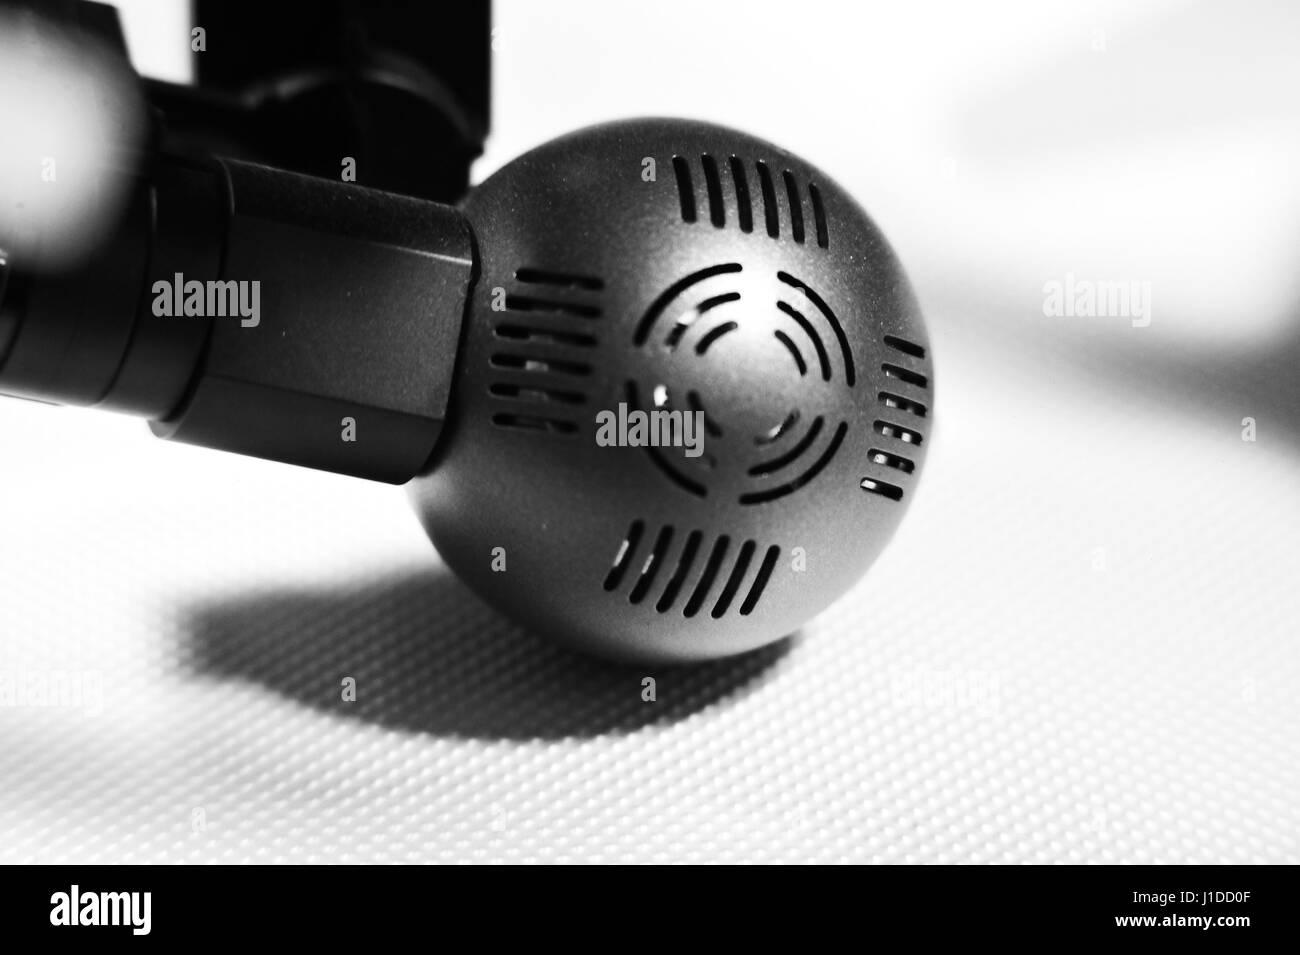 Drone Cam - Stock Image